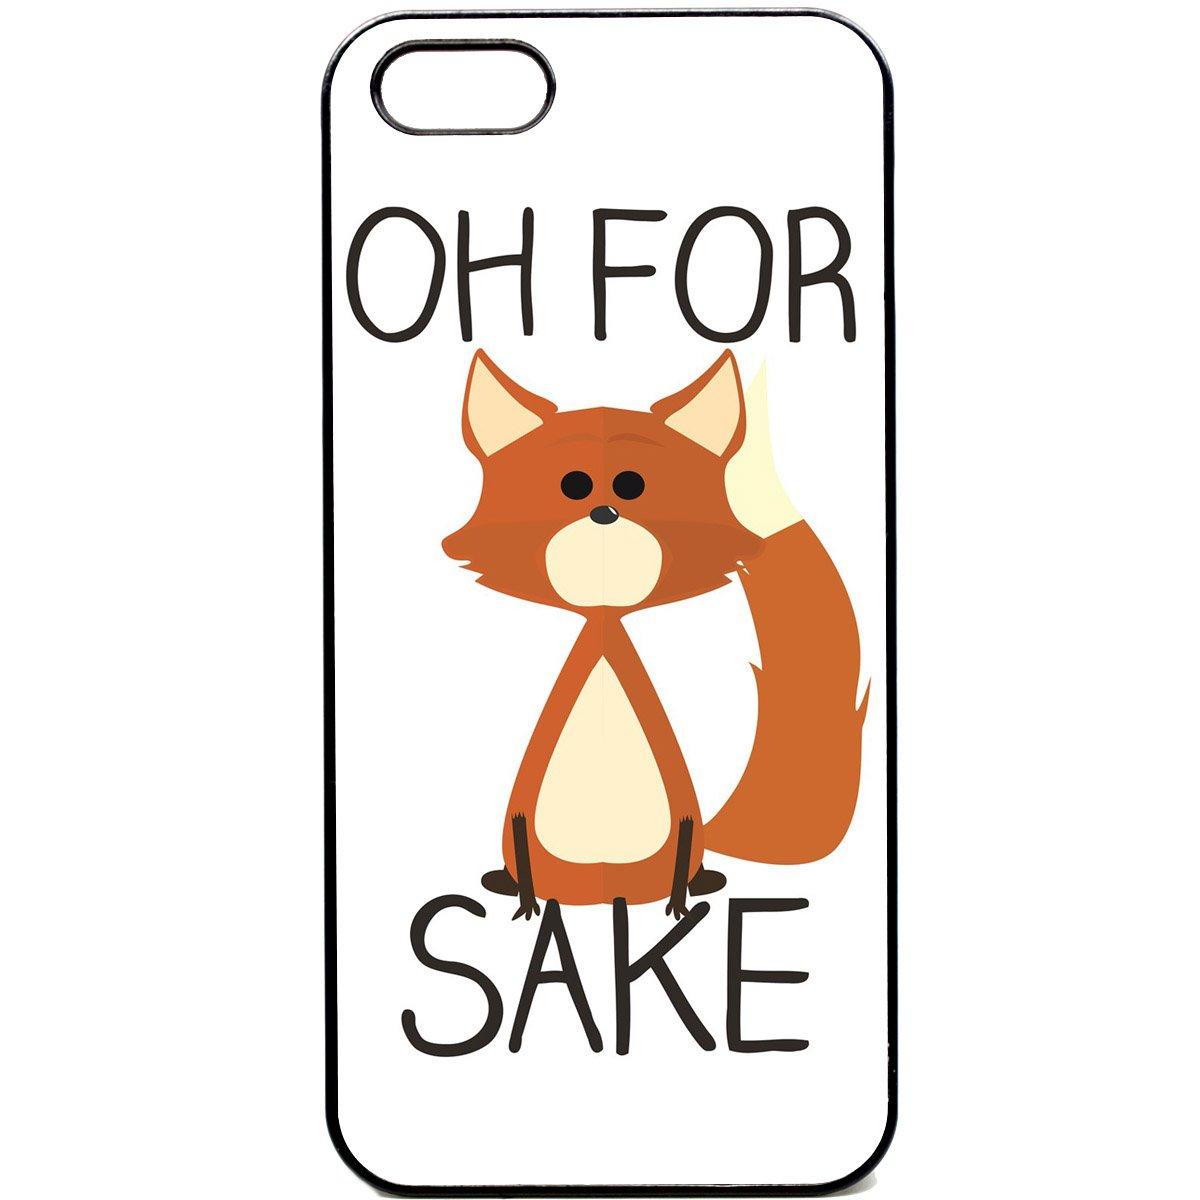 iPhone 5/5S custodia per Fox Sake divertente regalo caccia Reddit